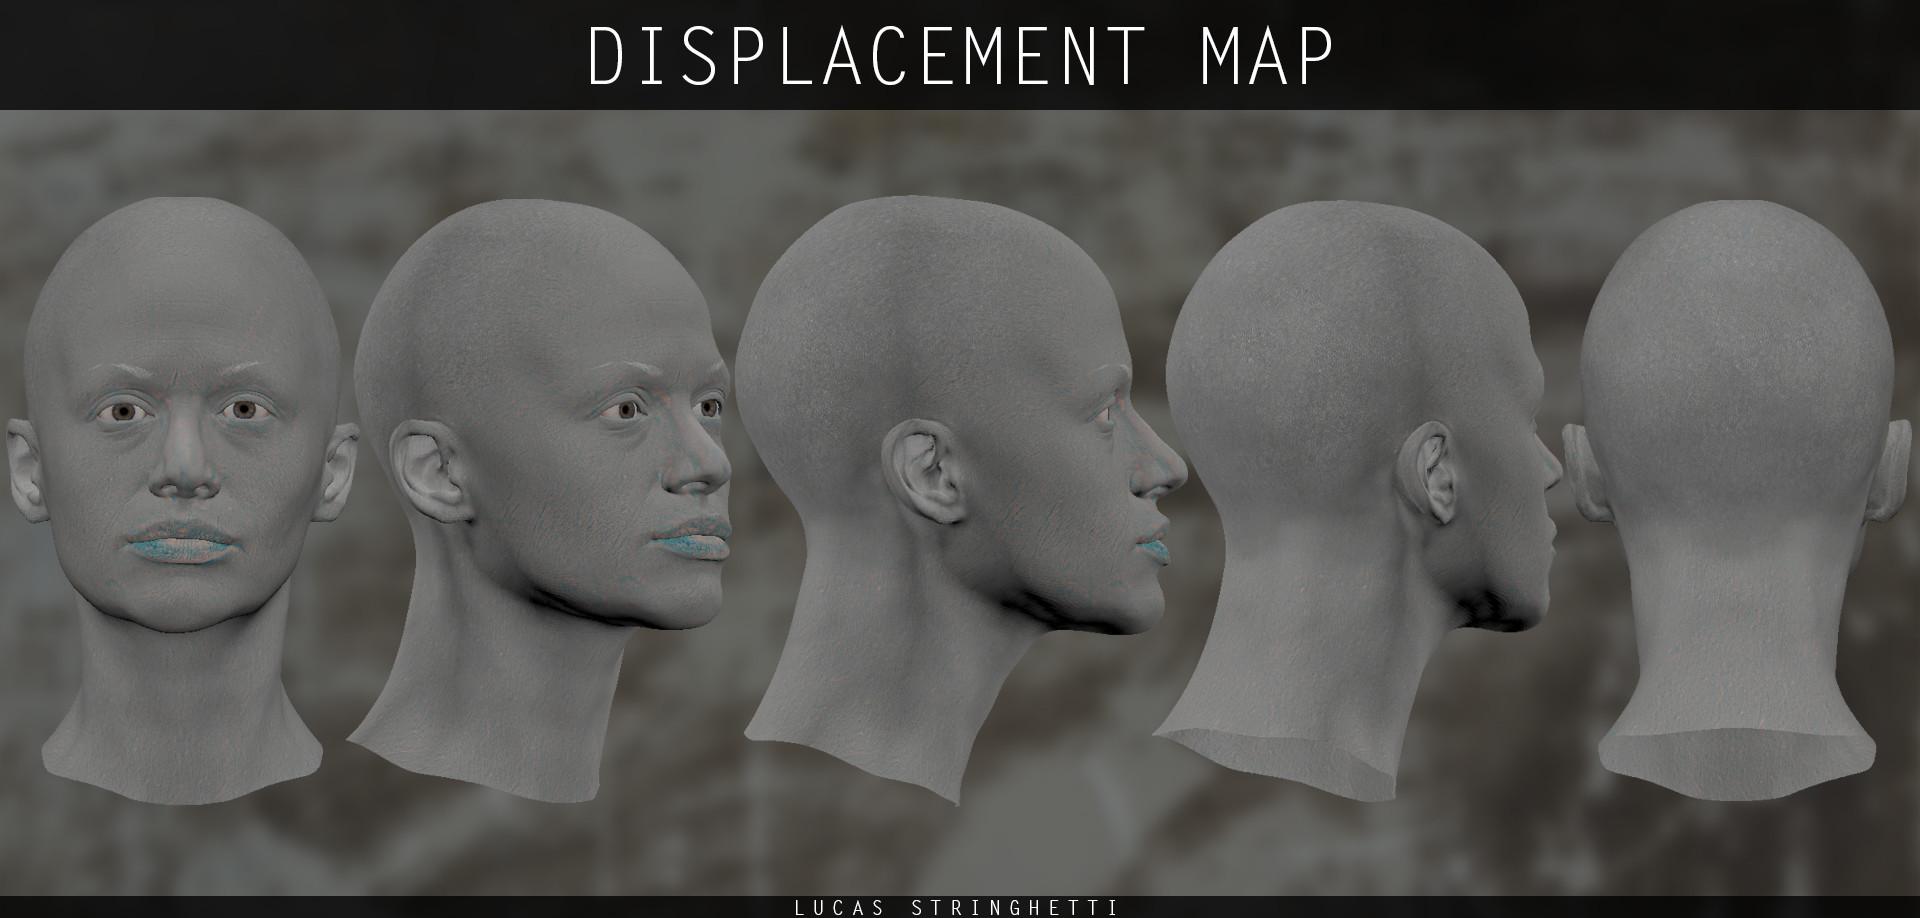 Lucas stringhetti 07 displacementmap